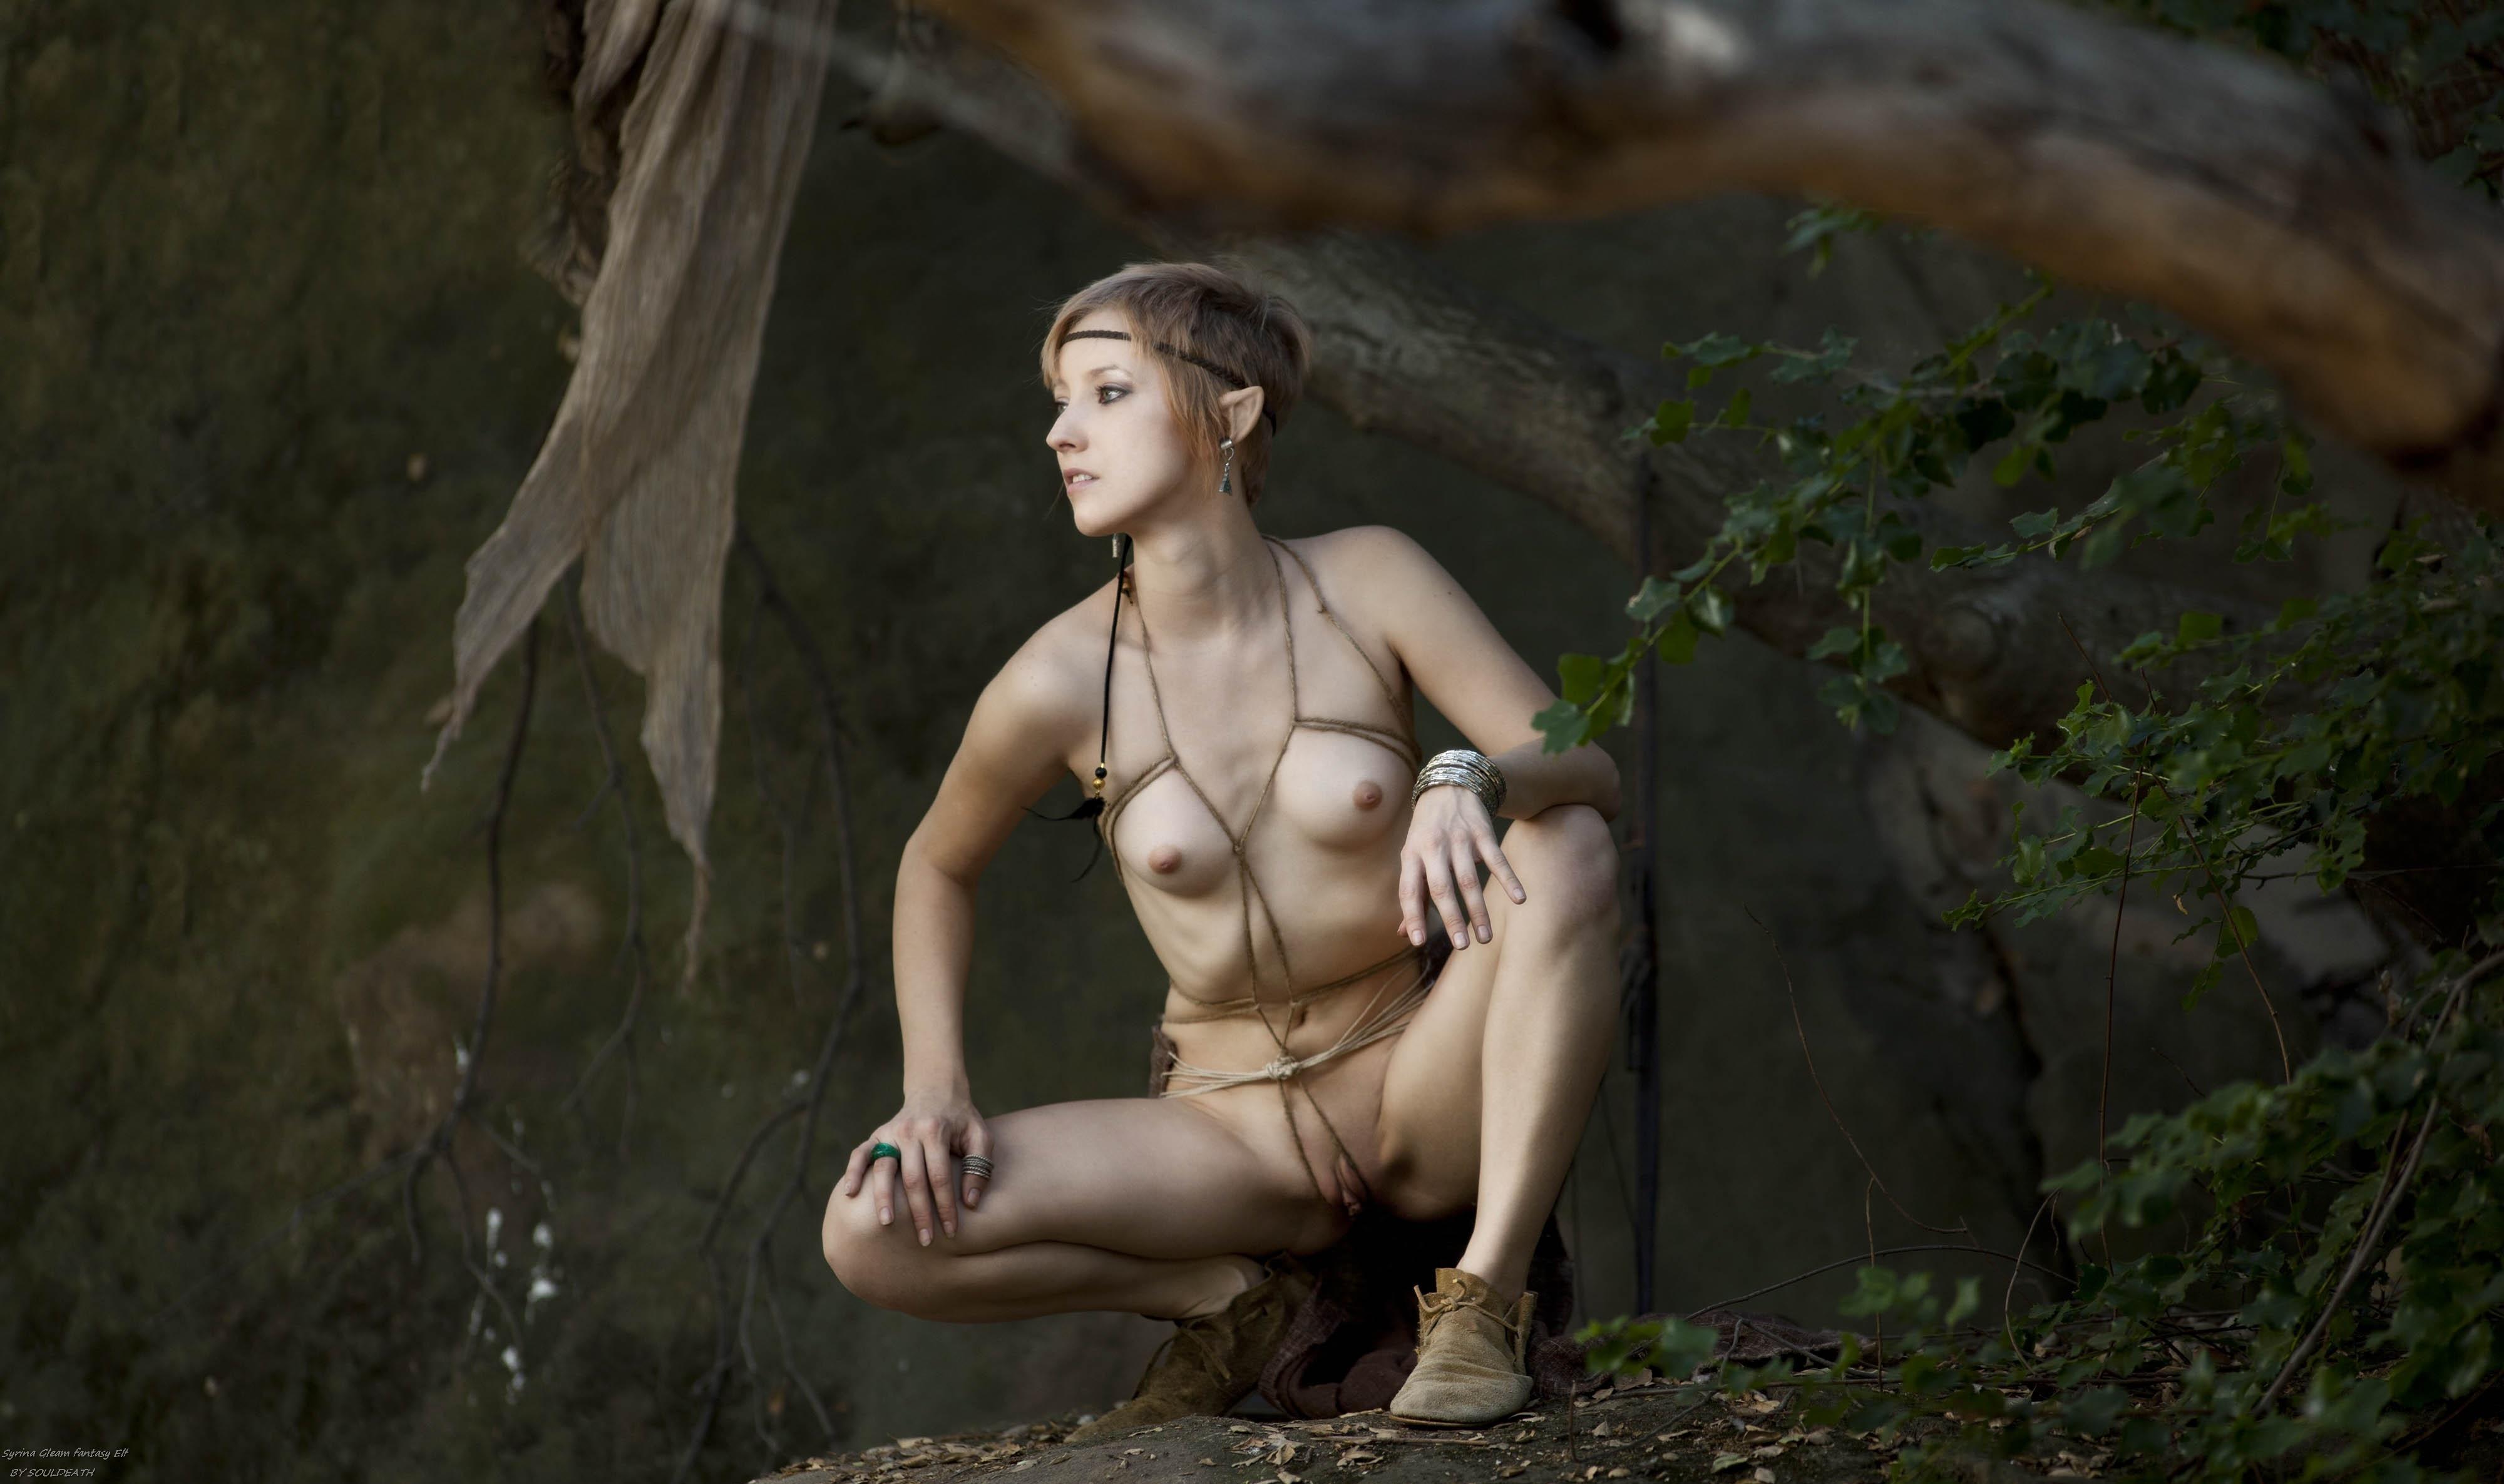 Tiny elf girl nude film